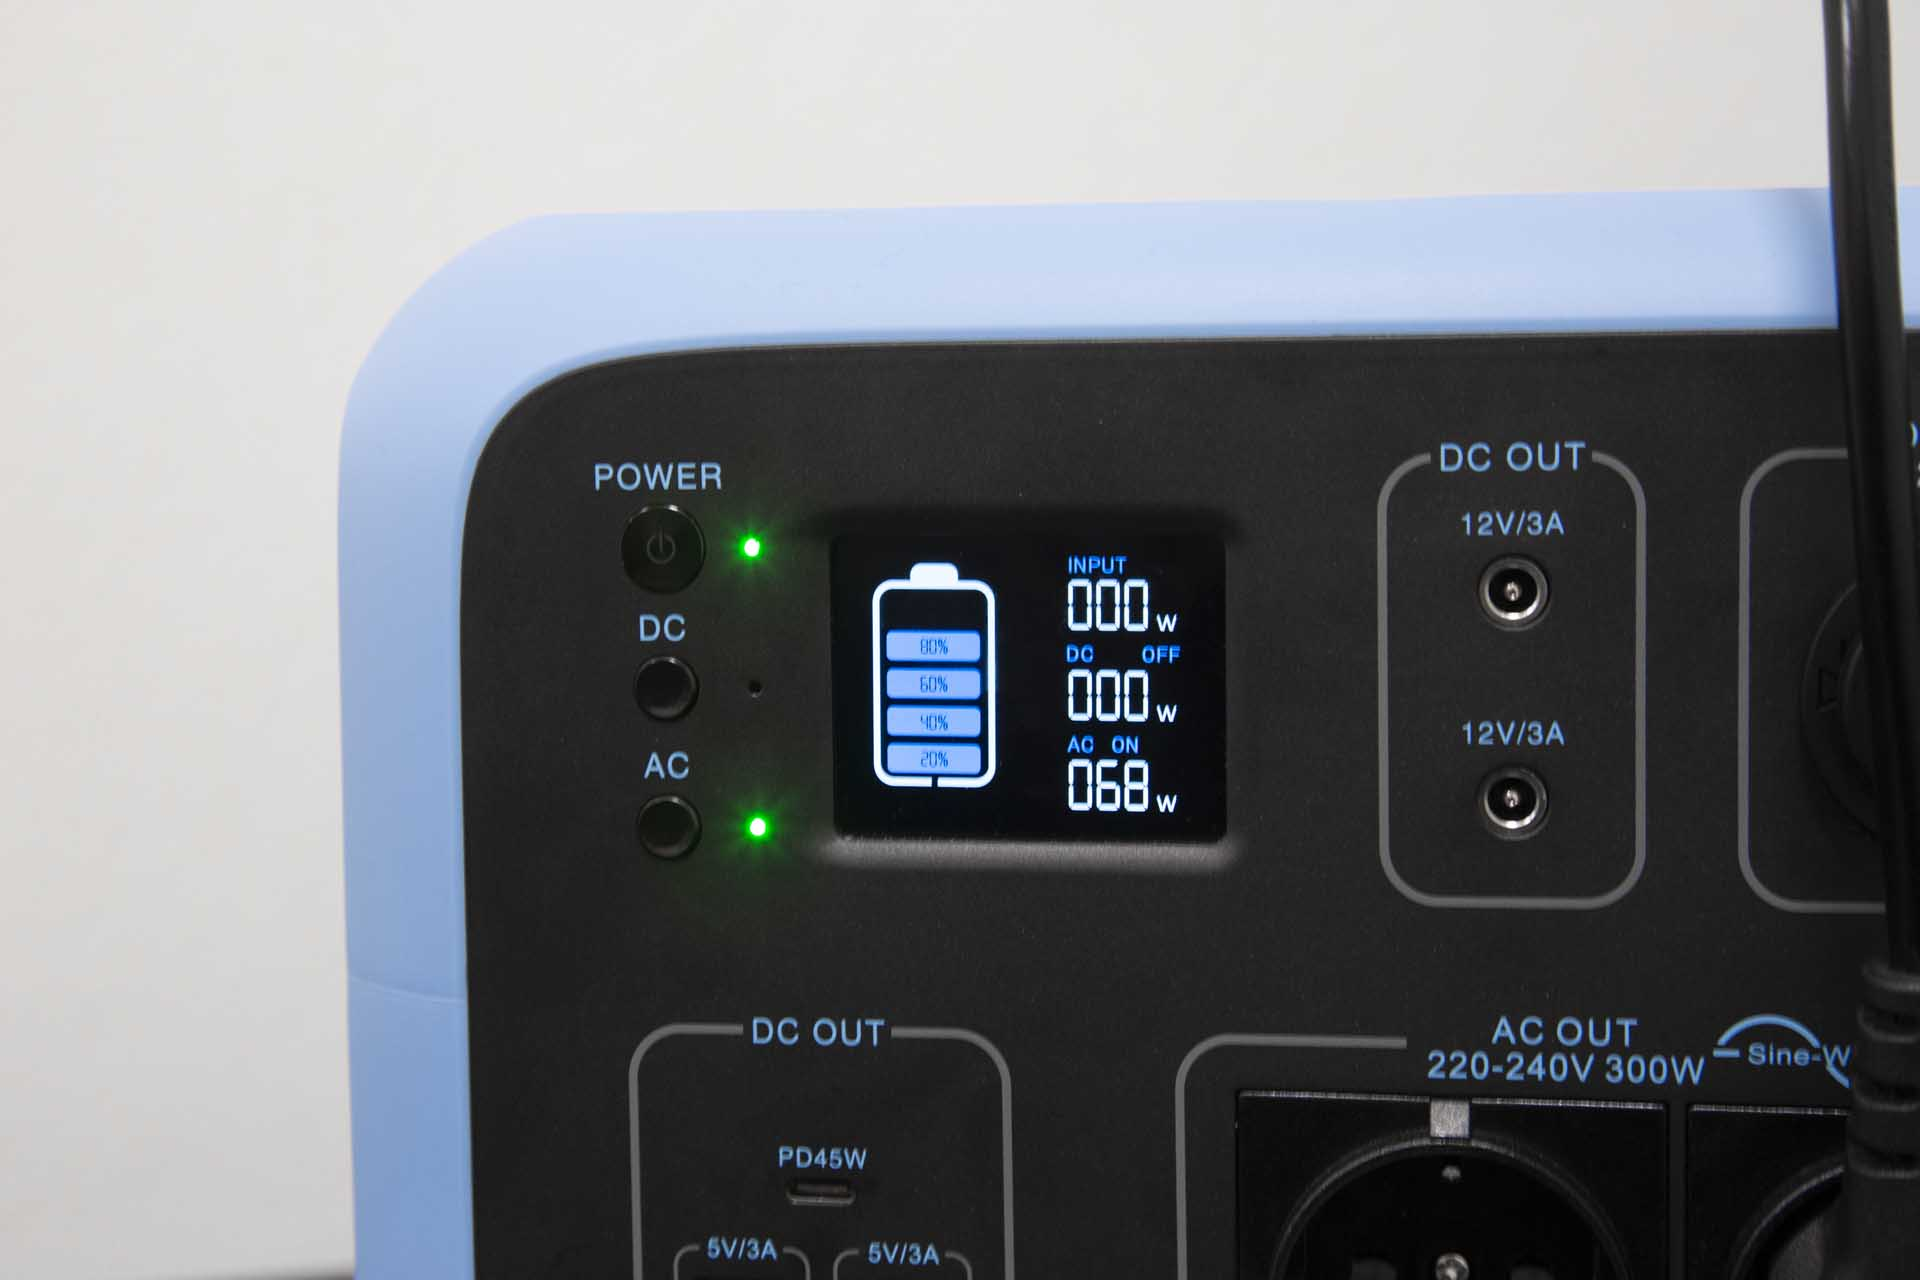 Bluetti AC50S display